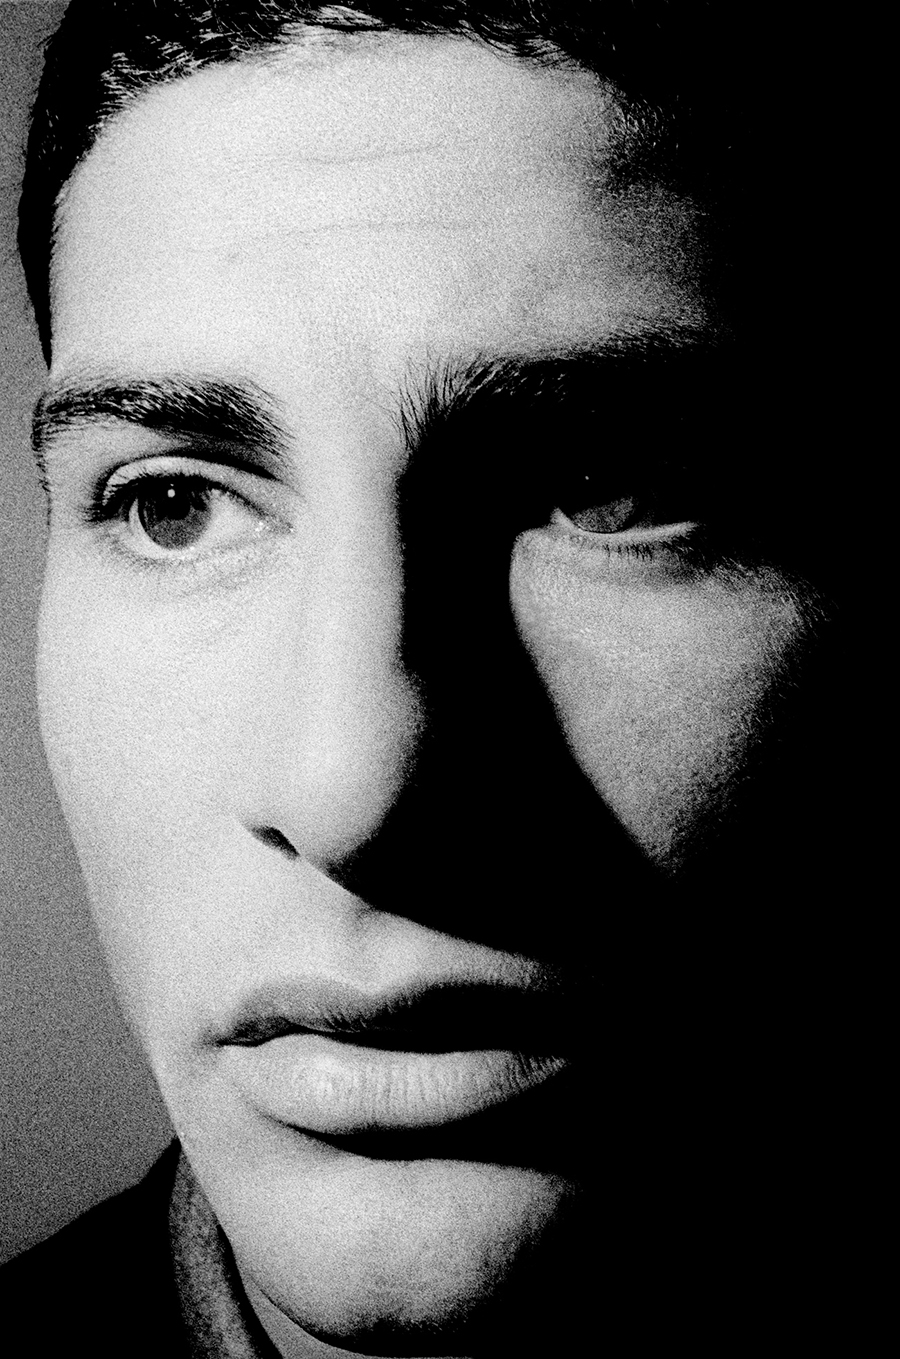 Tony_Ward_photography_early_work_portfolio_classics_portraiture_male_model_tungsten_light